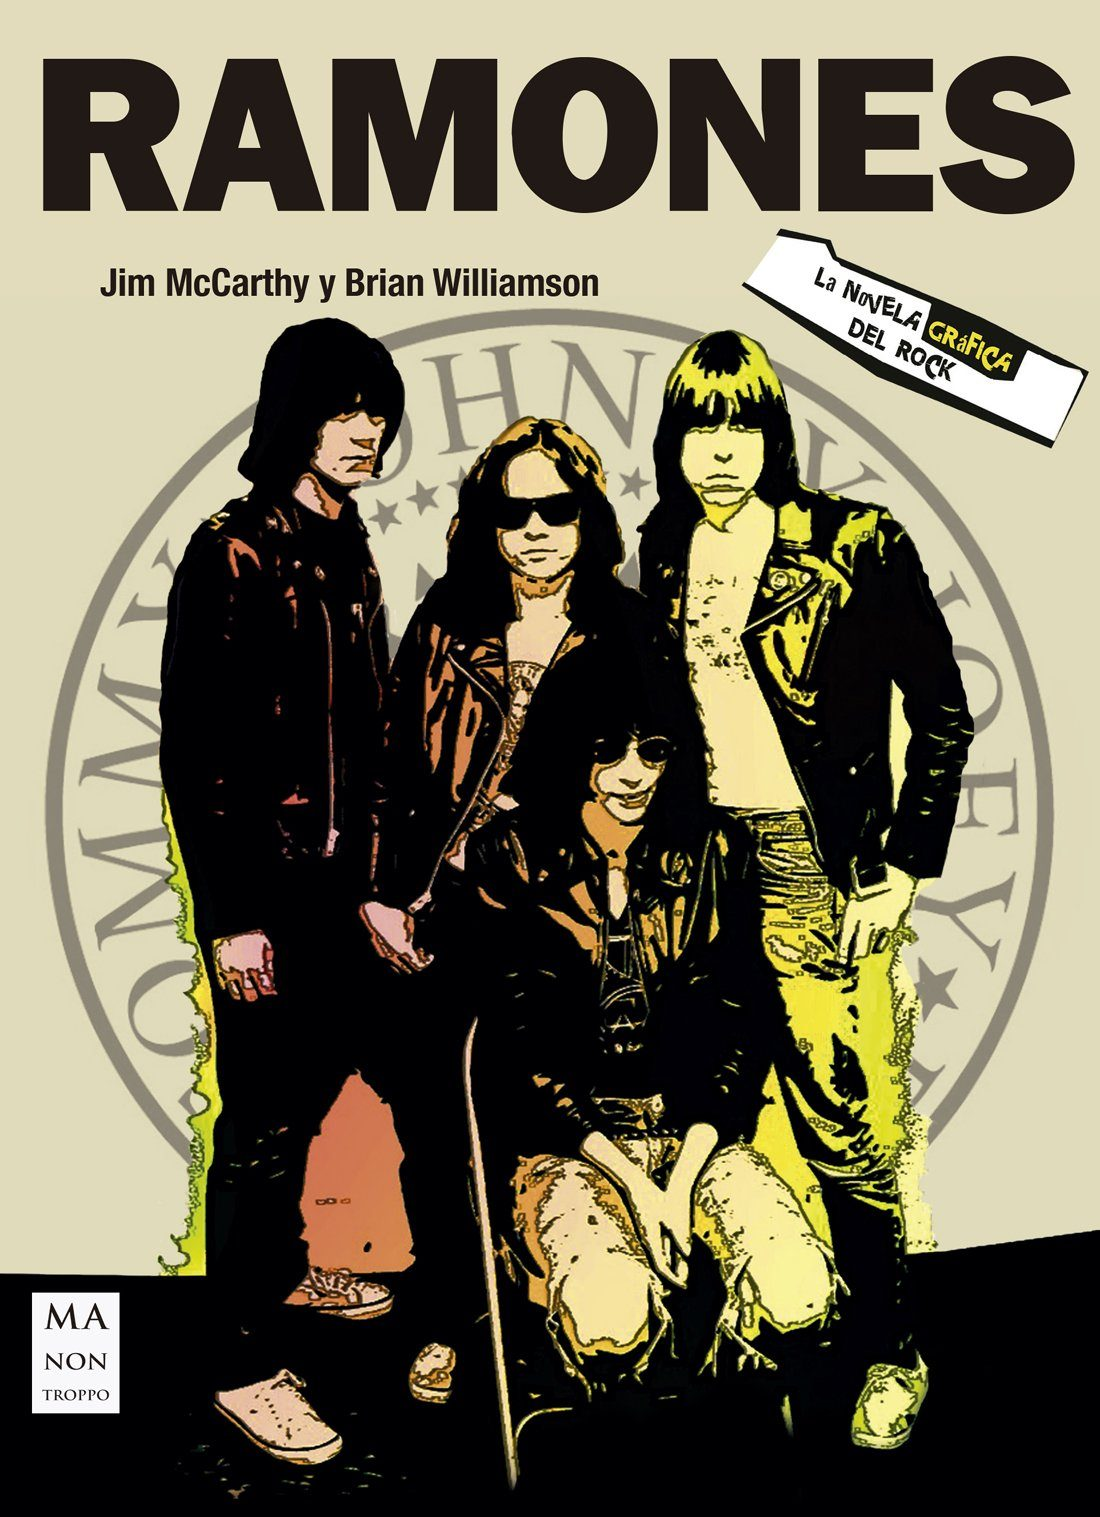 La novela gráfica del rock: Ramones